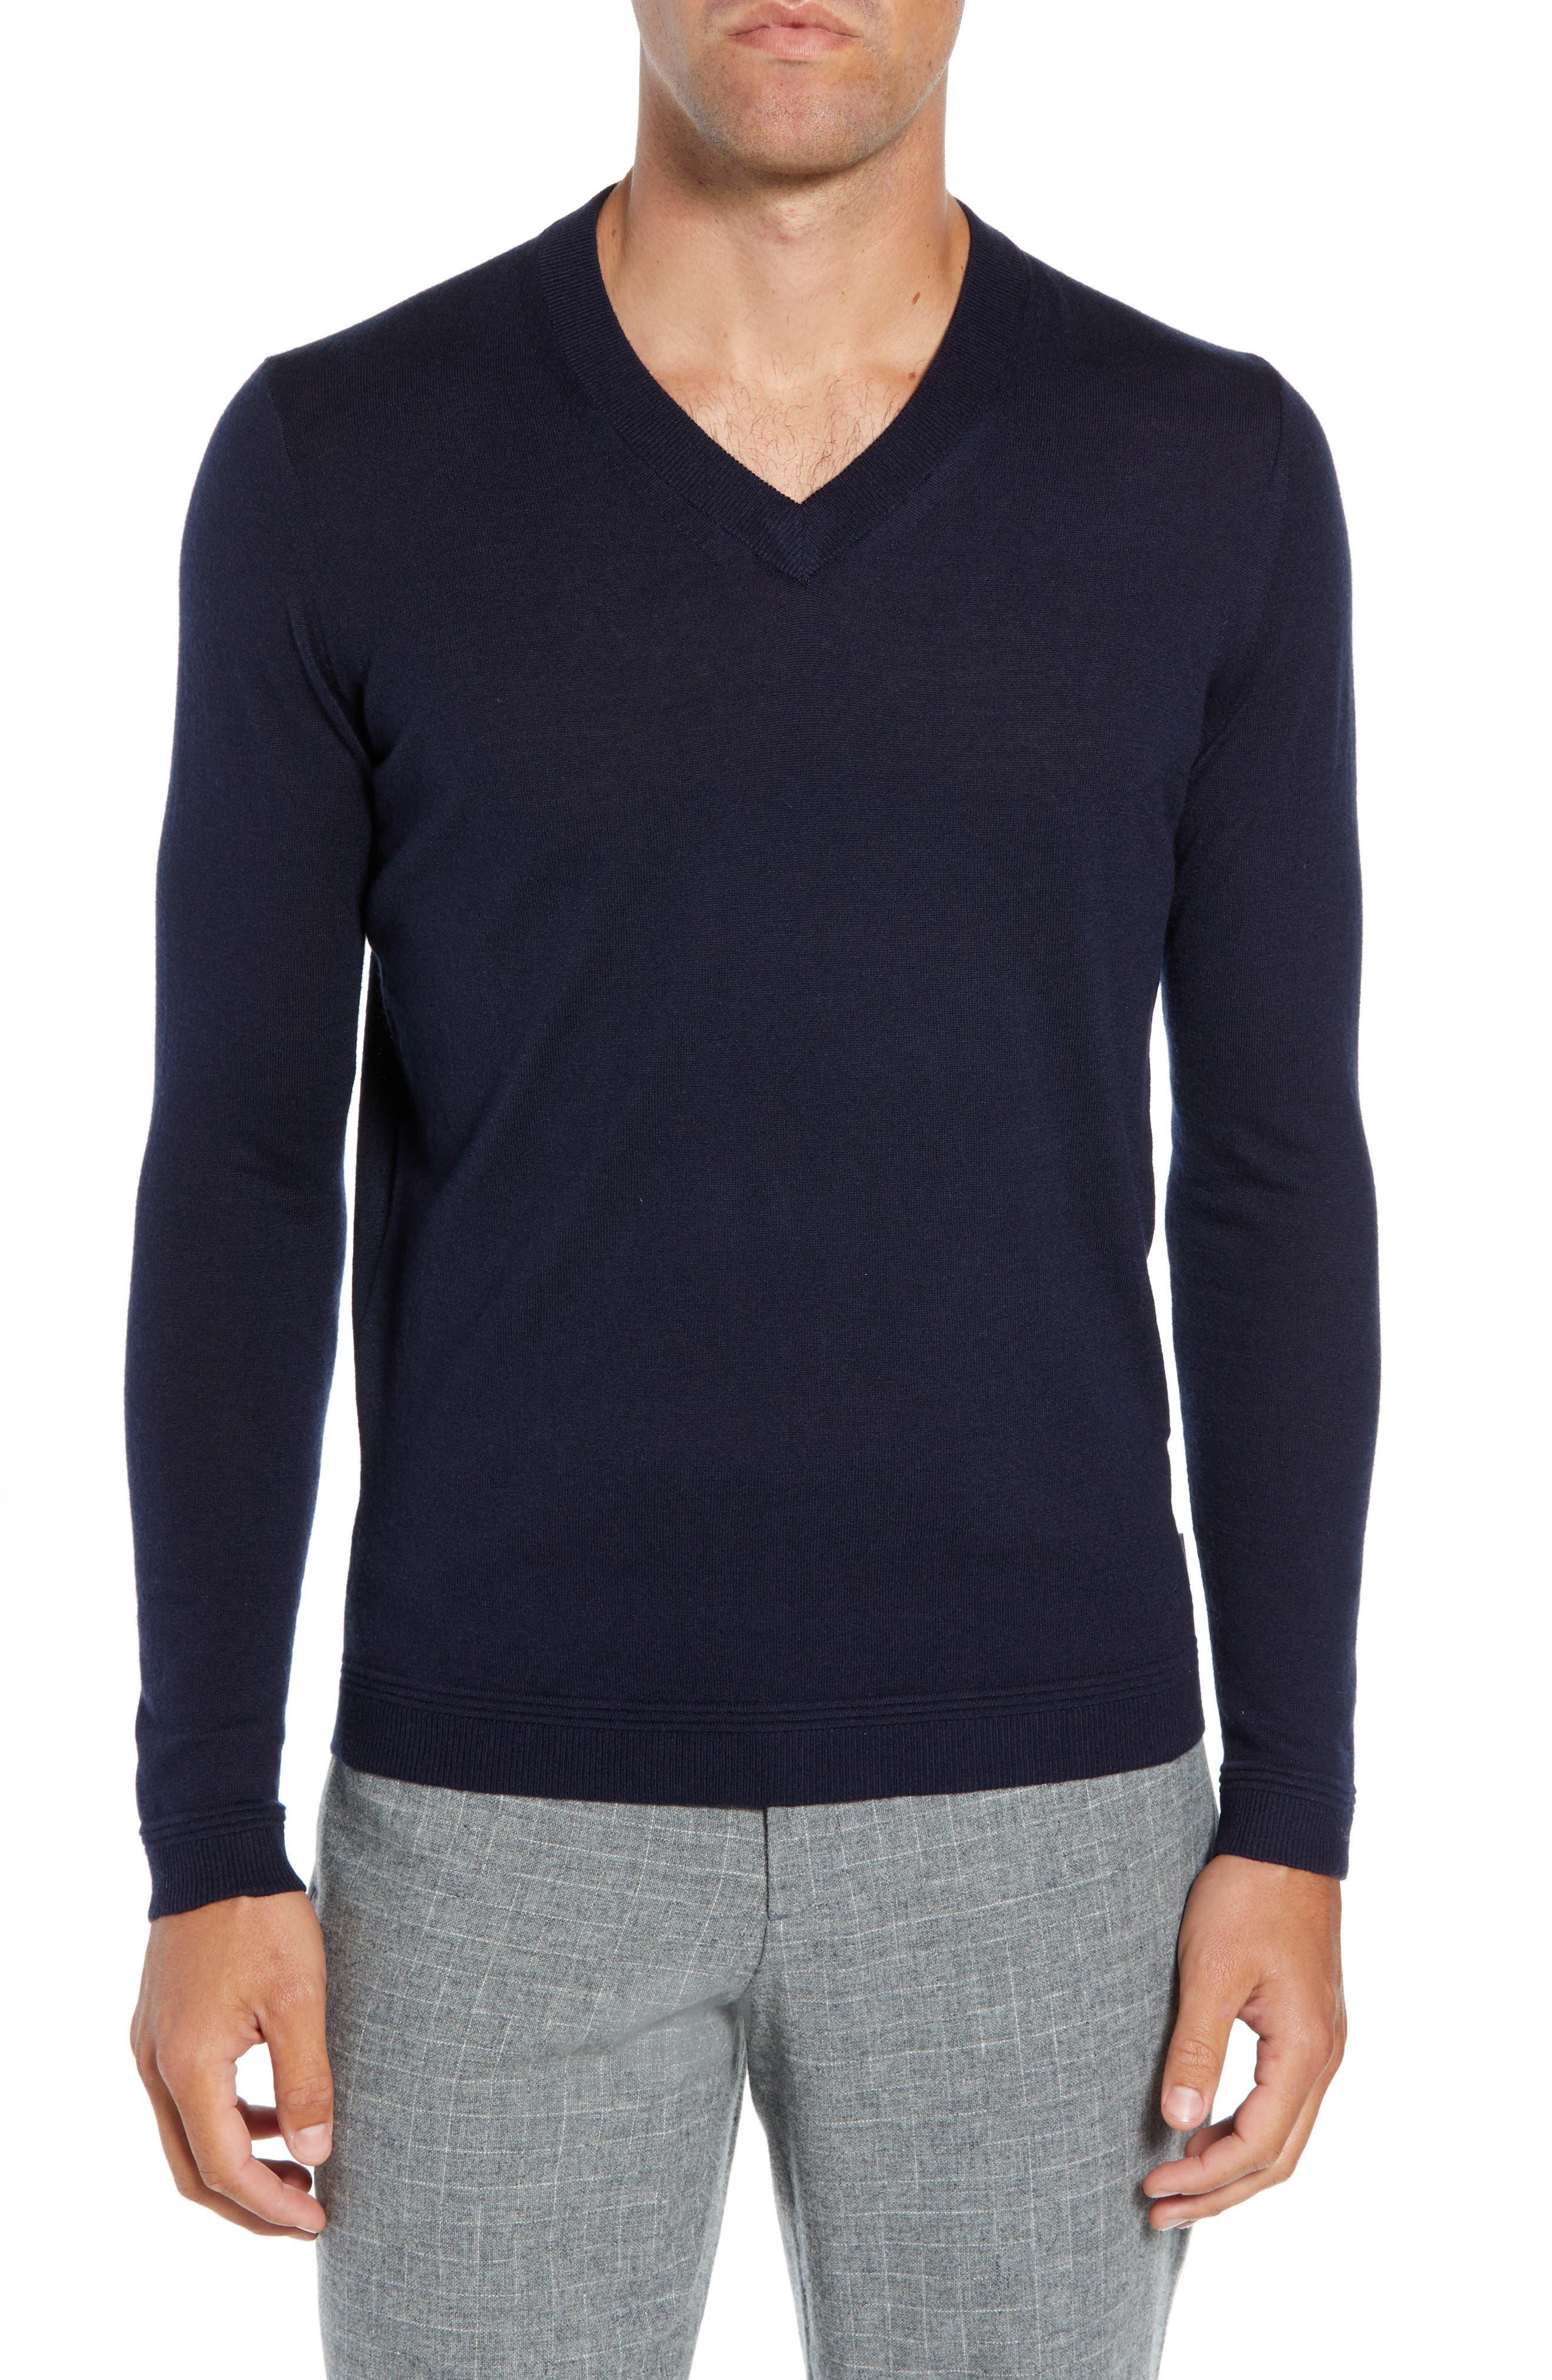 Ted Baker London Noel Slim Fit V-Neck Wool Blend Sweater, (m) - Blue